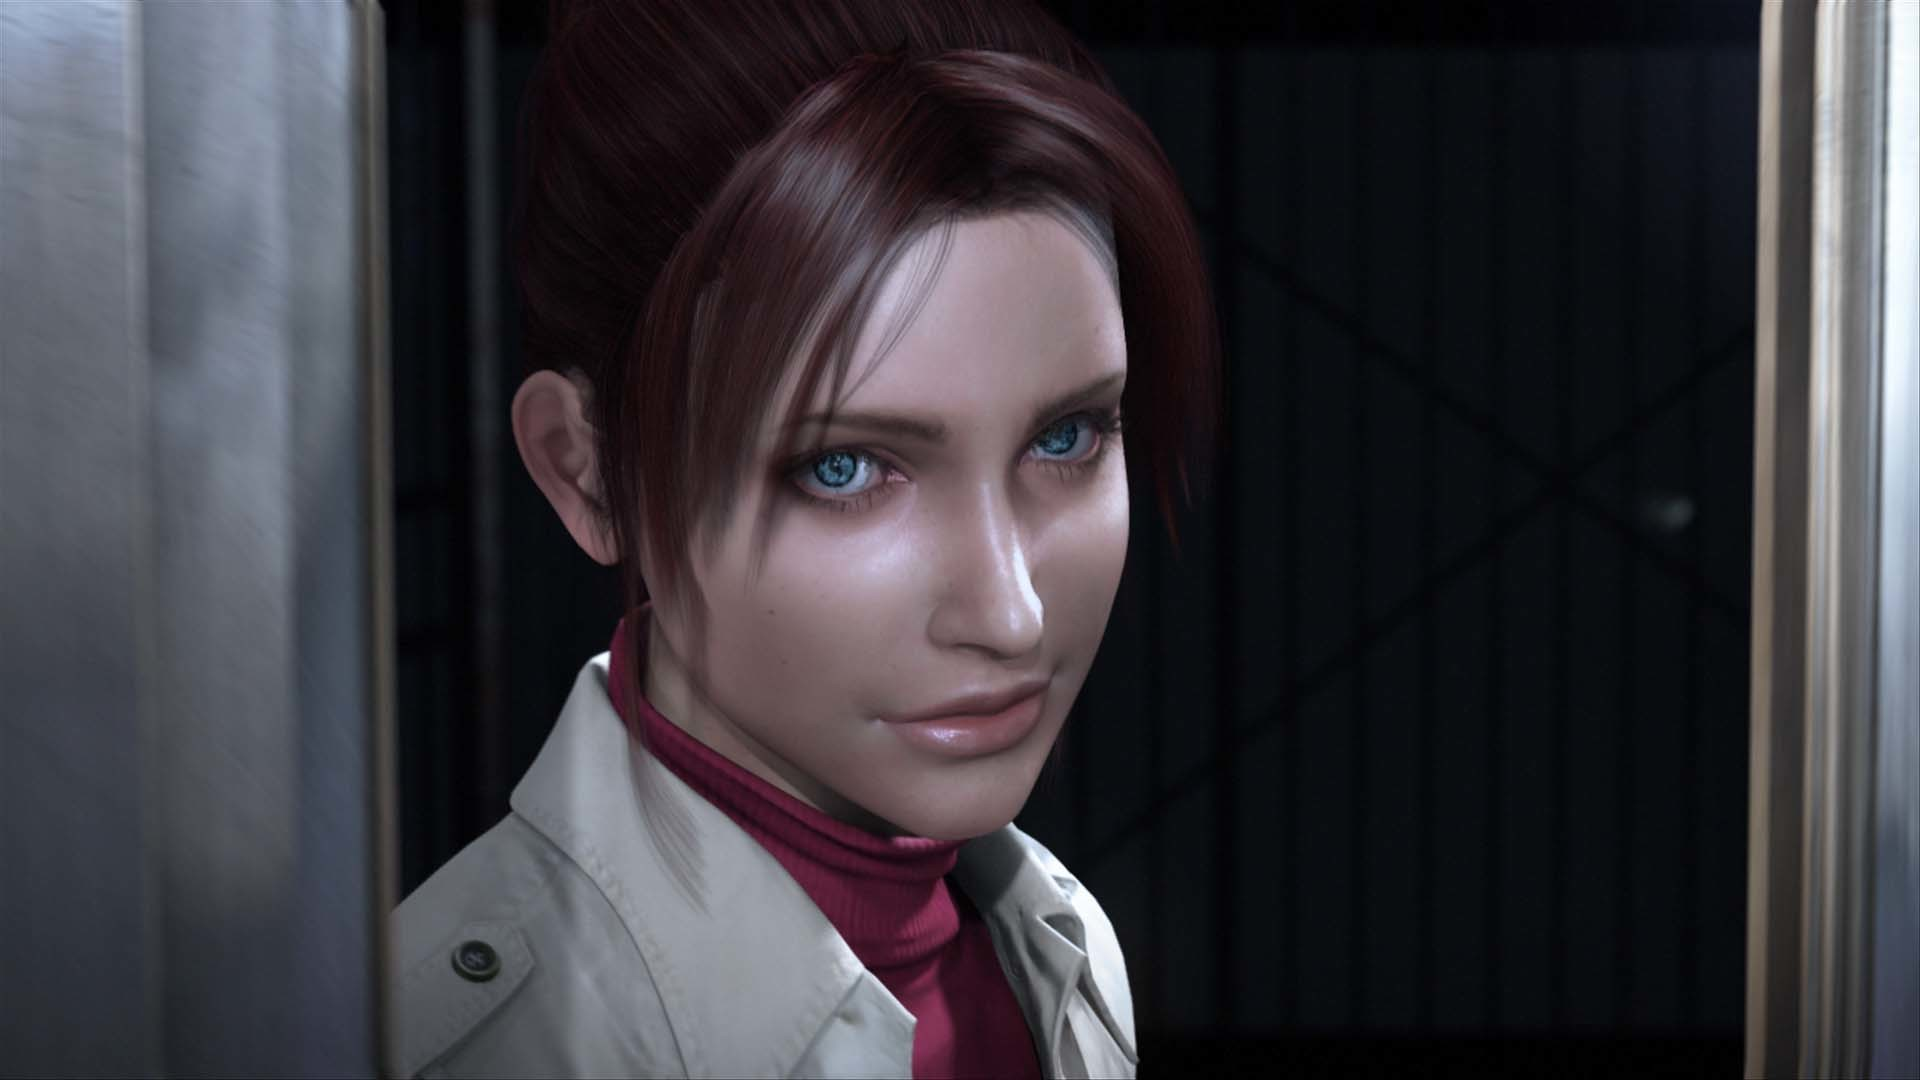 Res: 1920x1080, Claire Redfield Resident Evil Degeneration wallpaper 73182